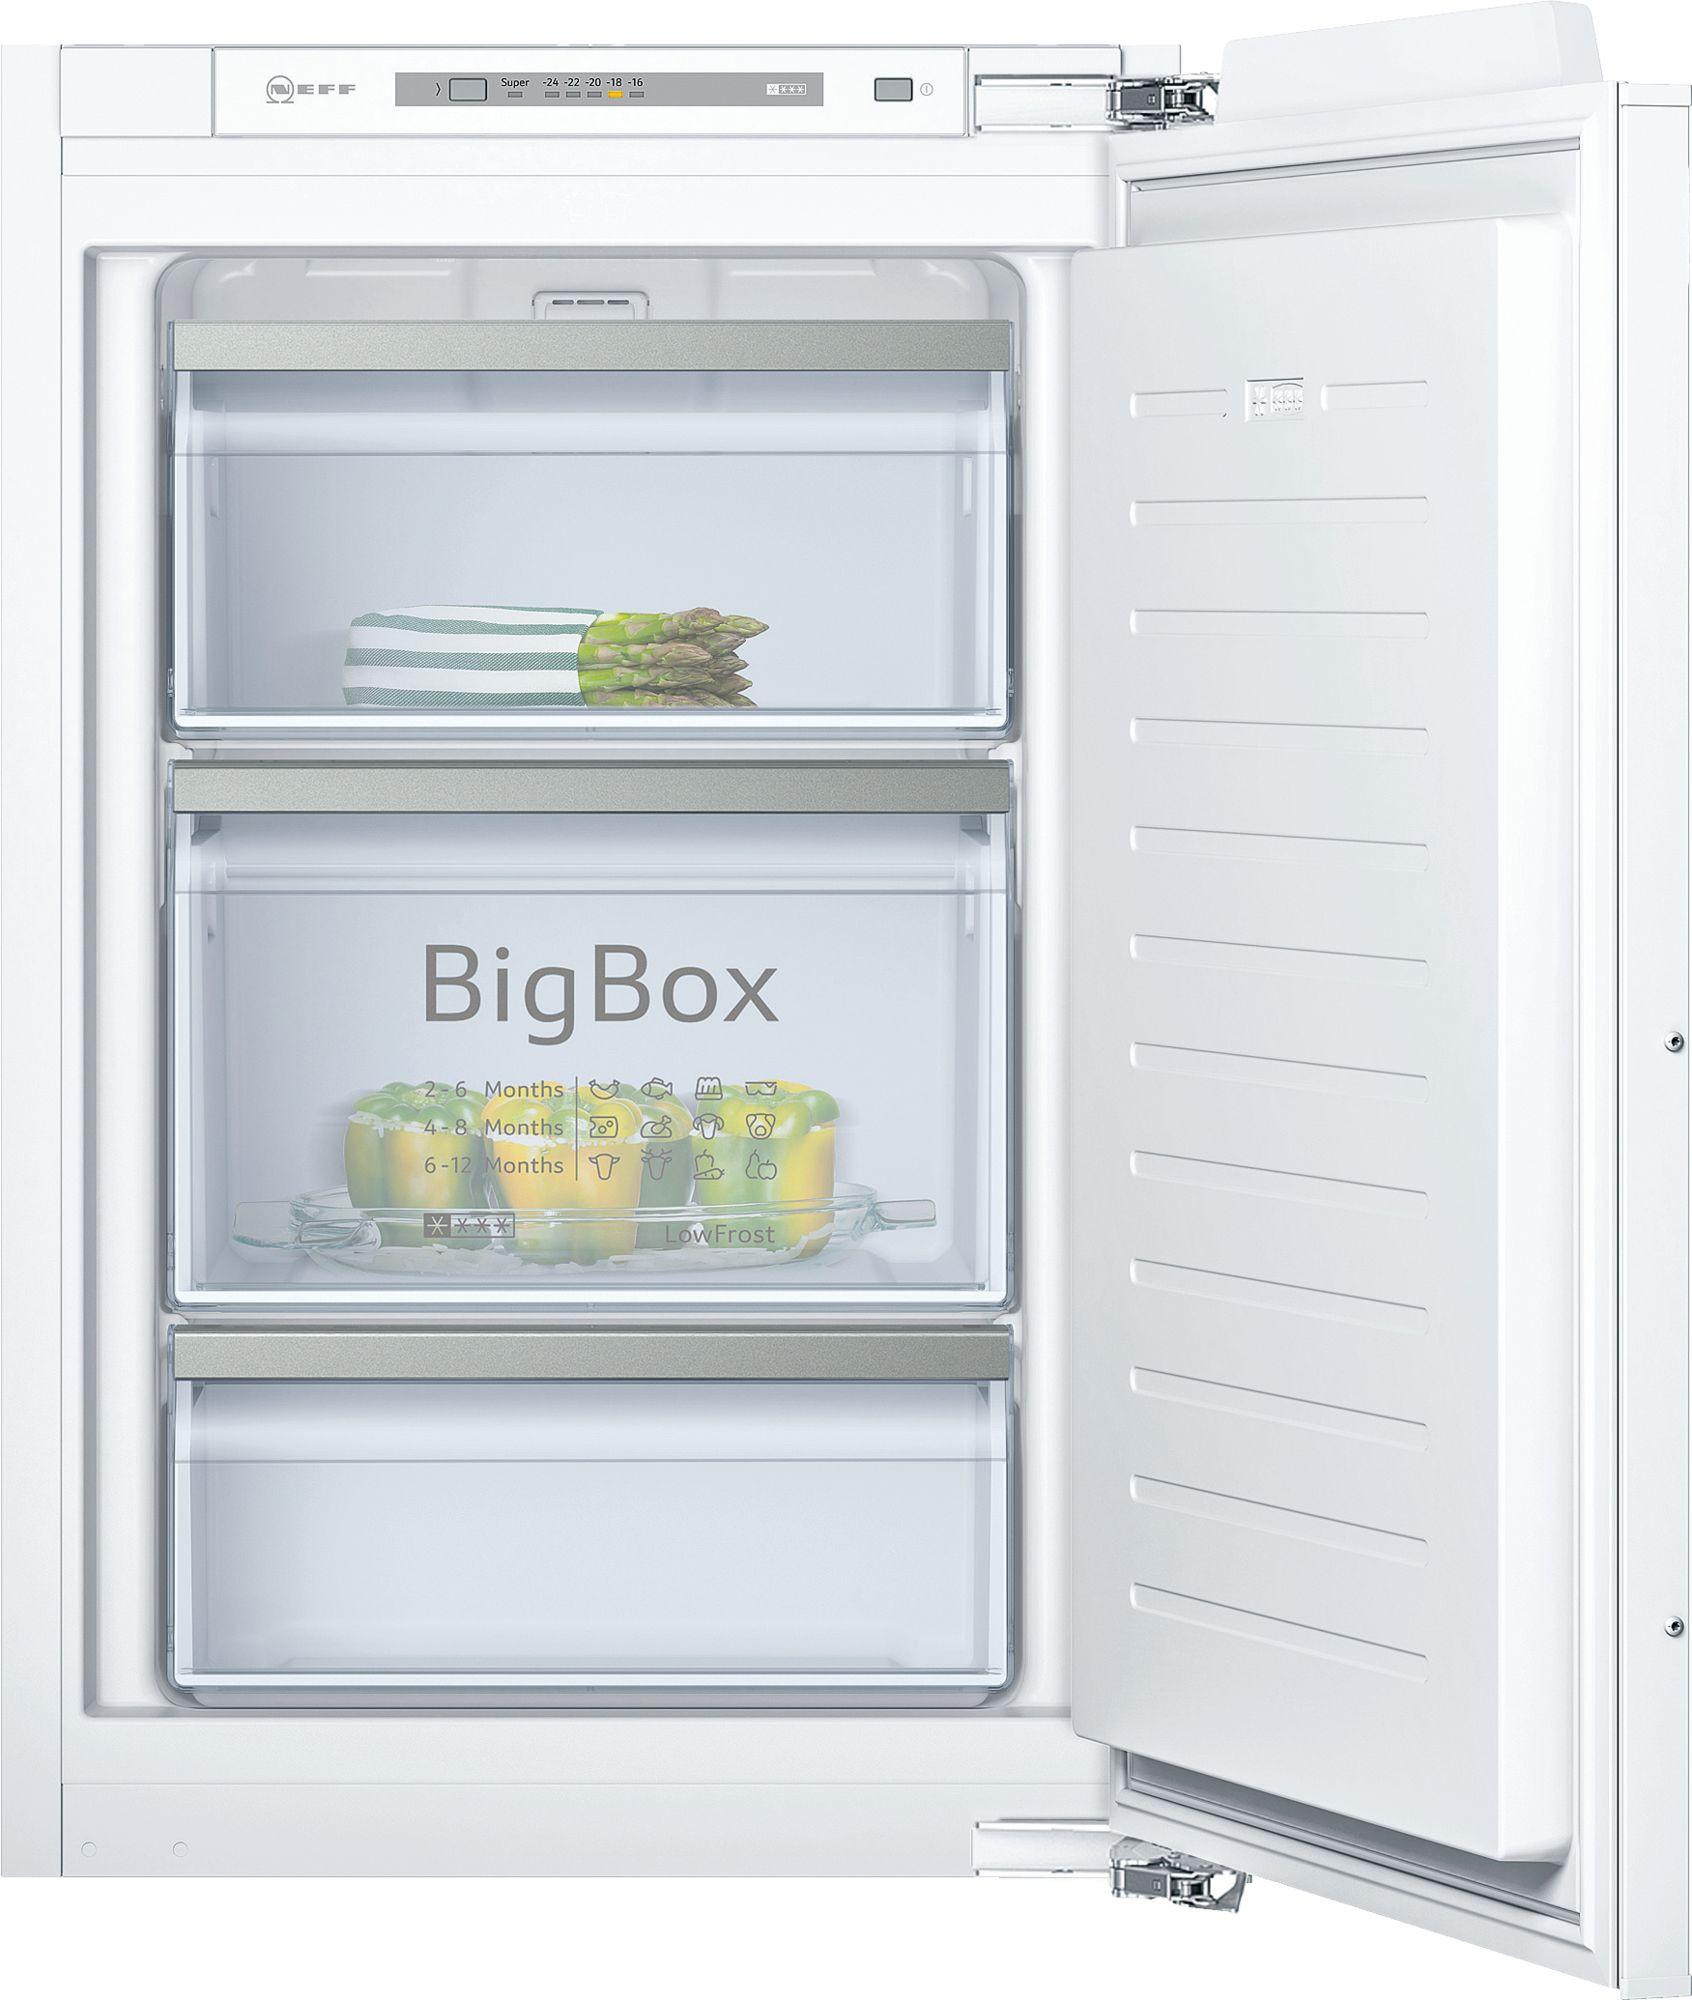 Neff N70 Built-In Freezer 87.4 x 55.8cm GI1216DE0